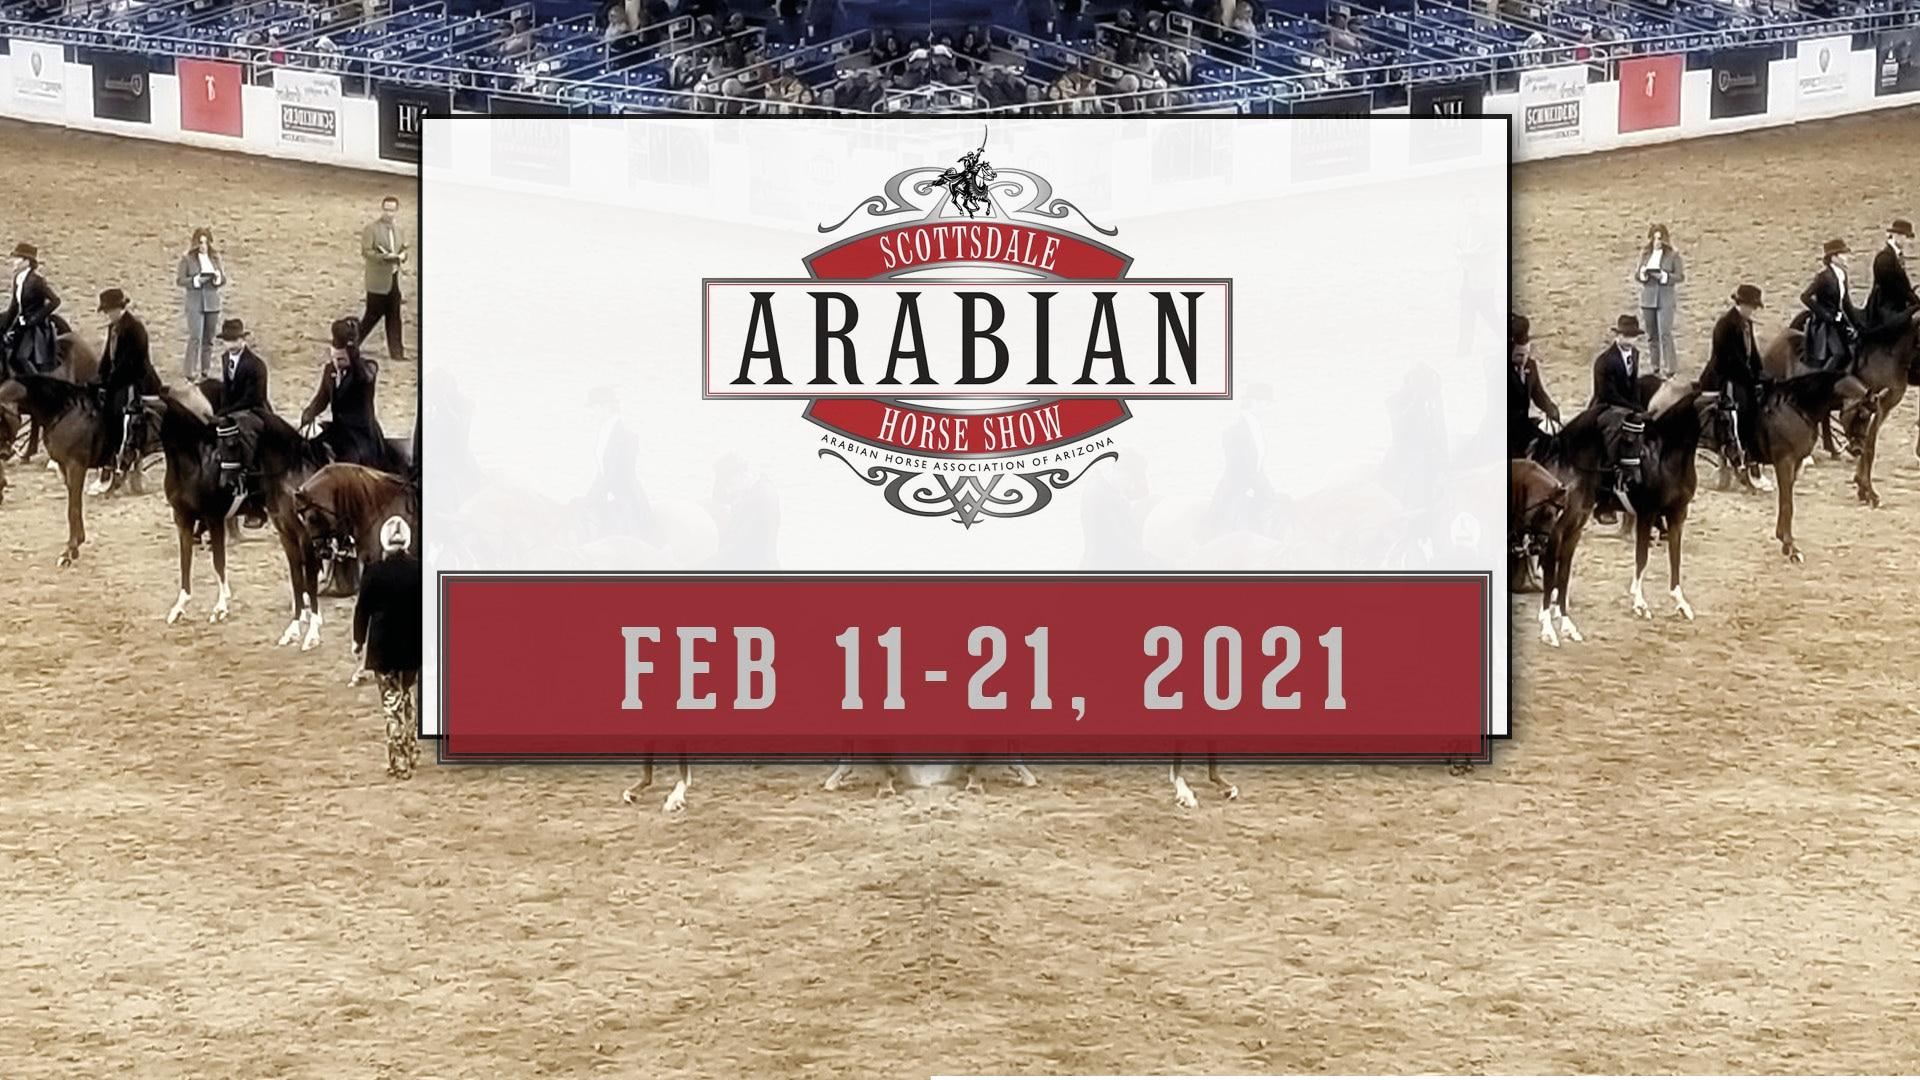 Scottsdale Arabian Horse Show, Feb 11-21, 2021